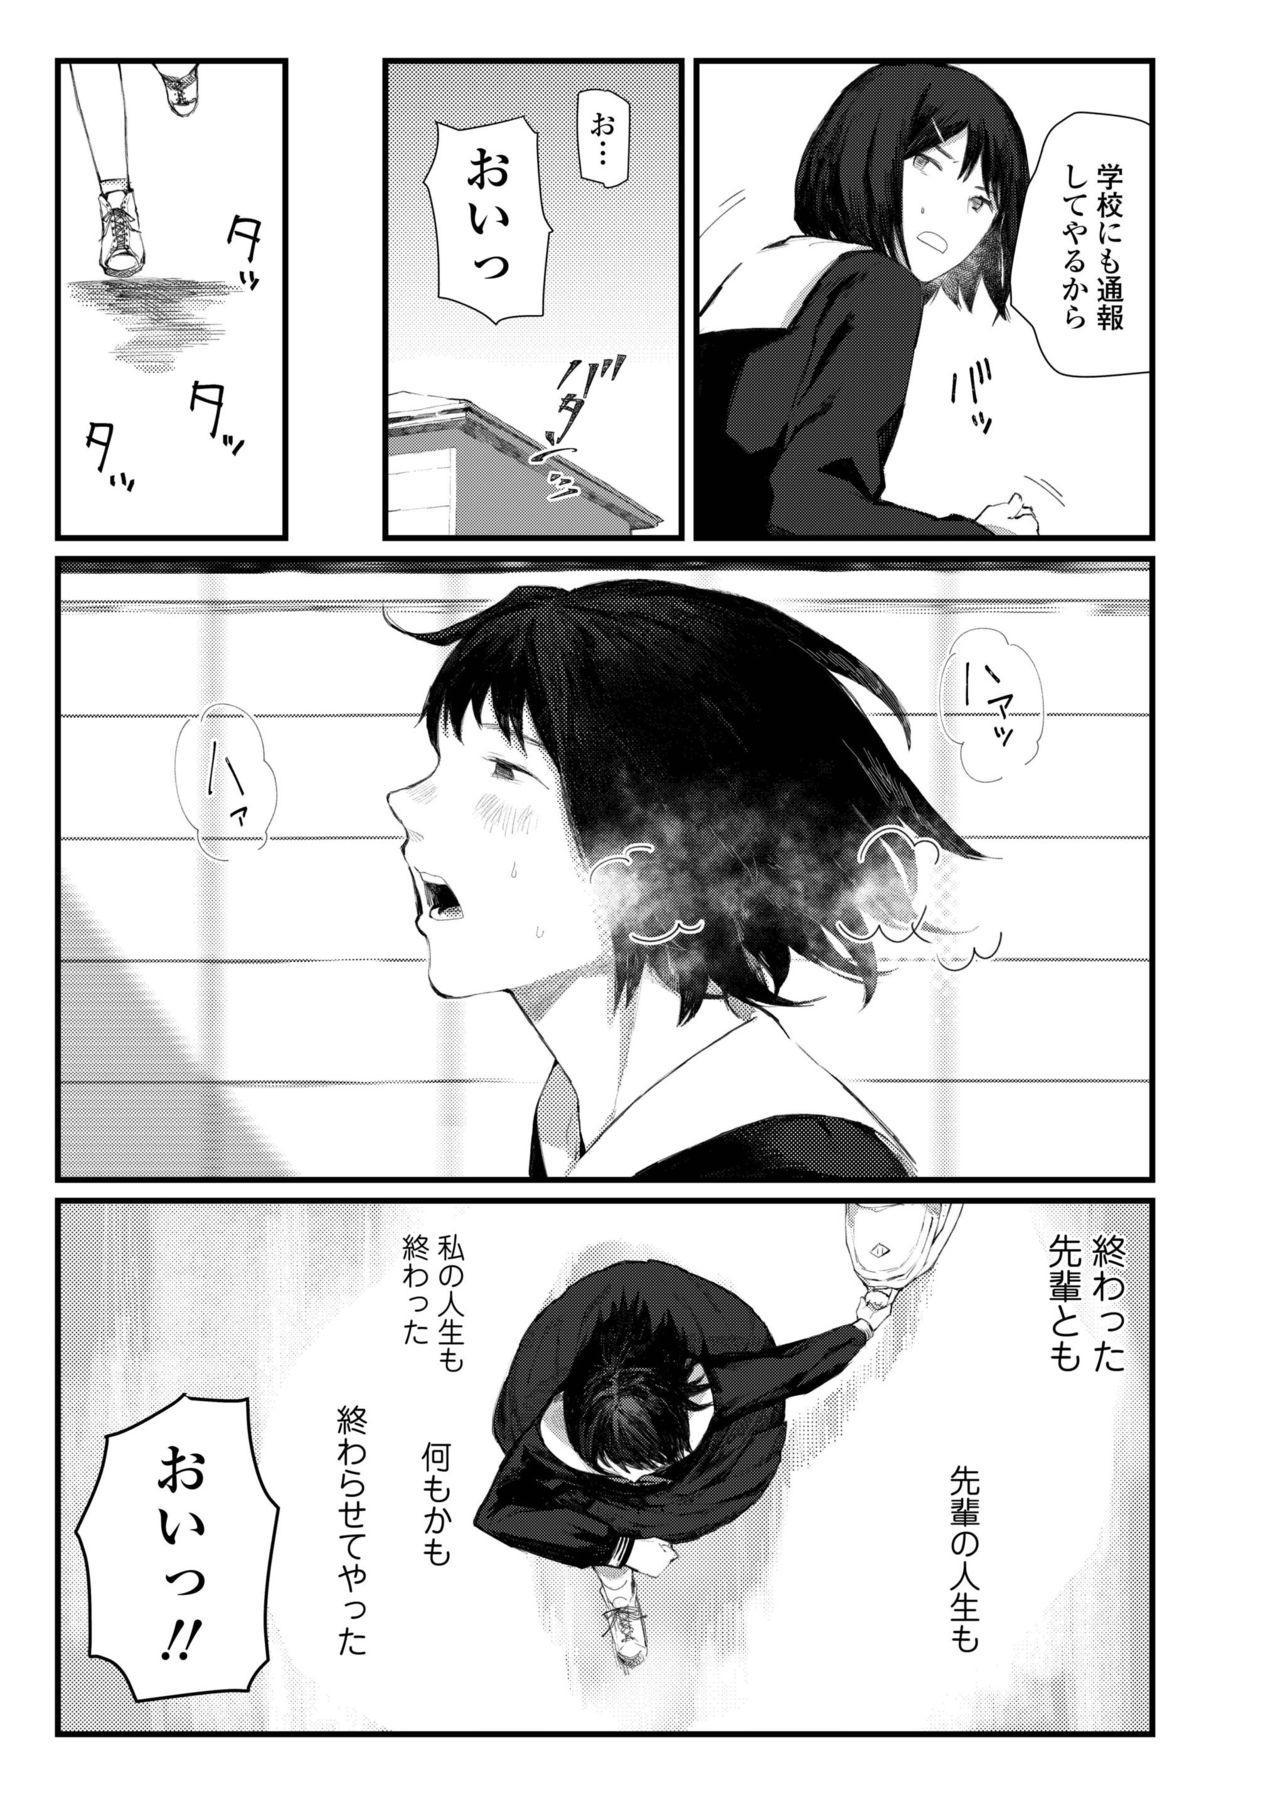 COMIC AOHA 2019 Haru 476